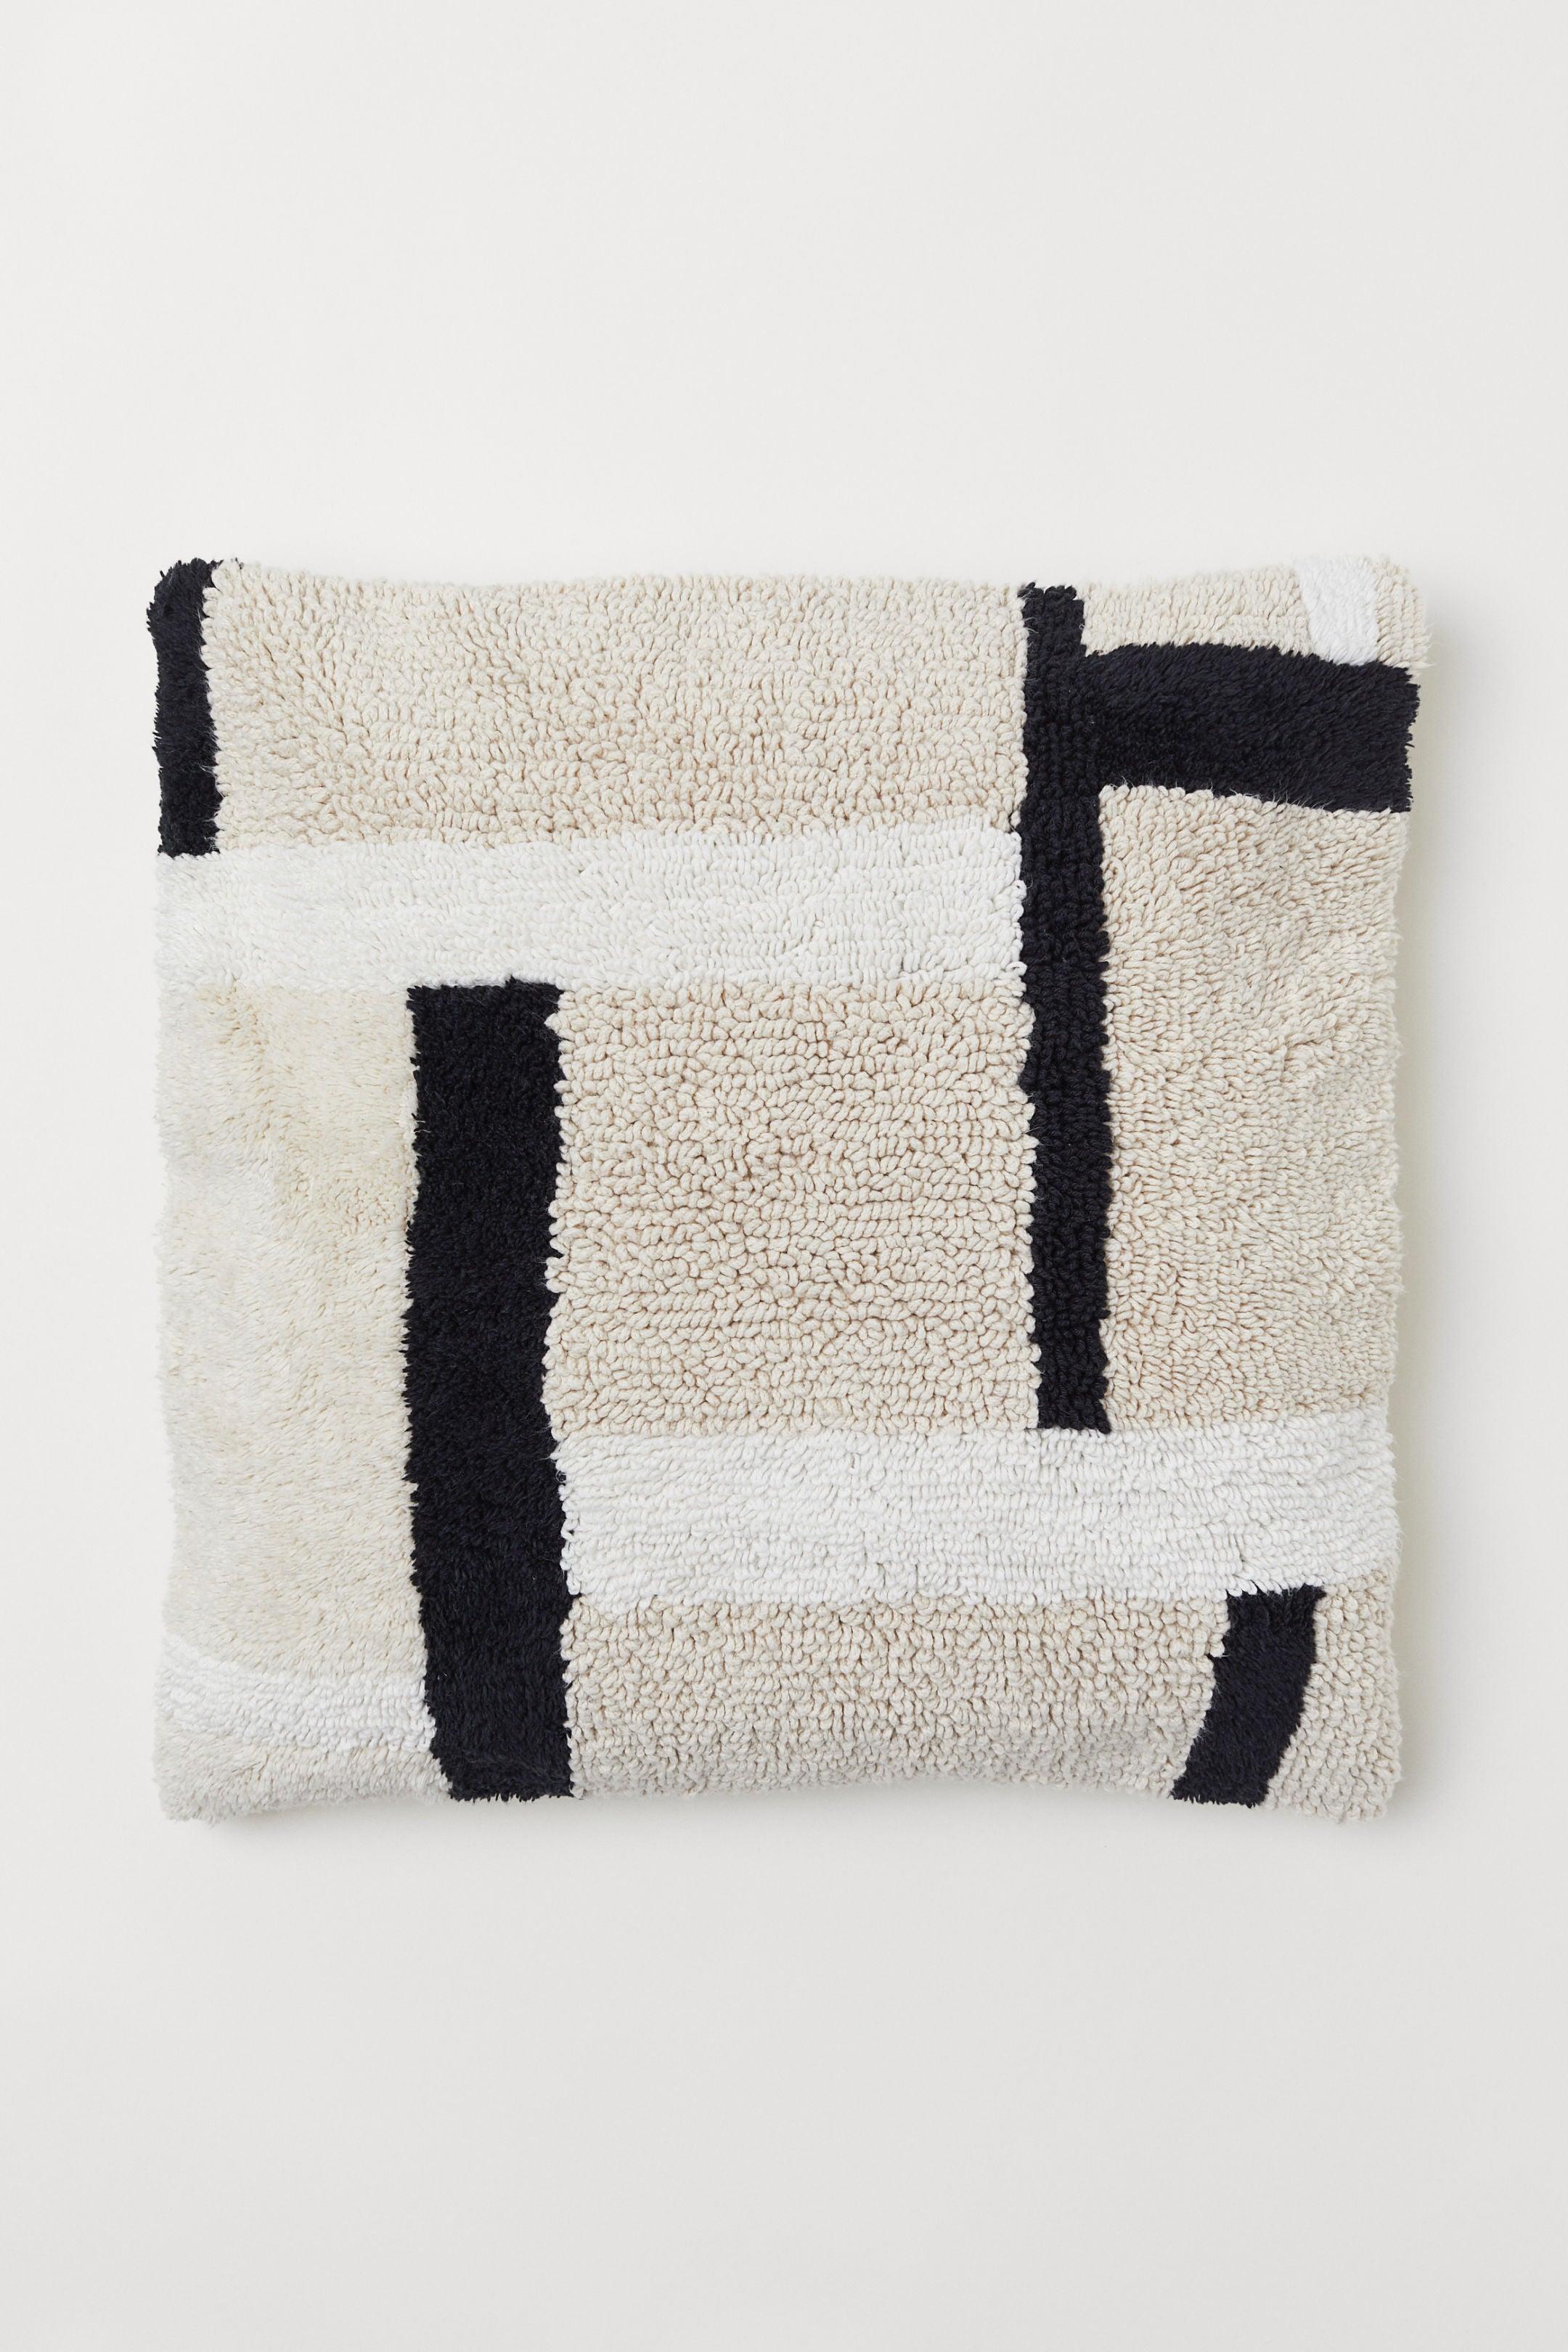 black and white geometric cushion cover